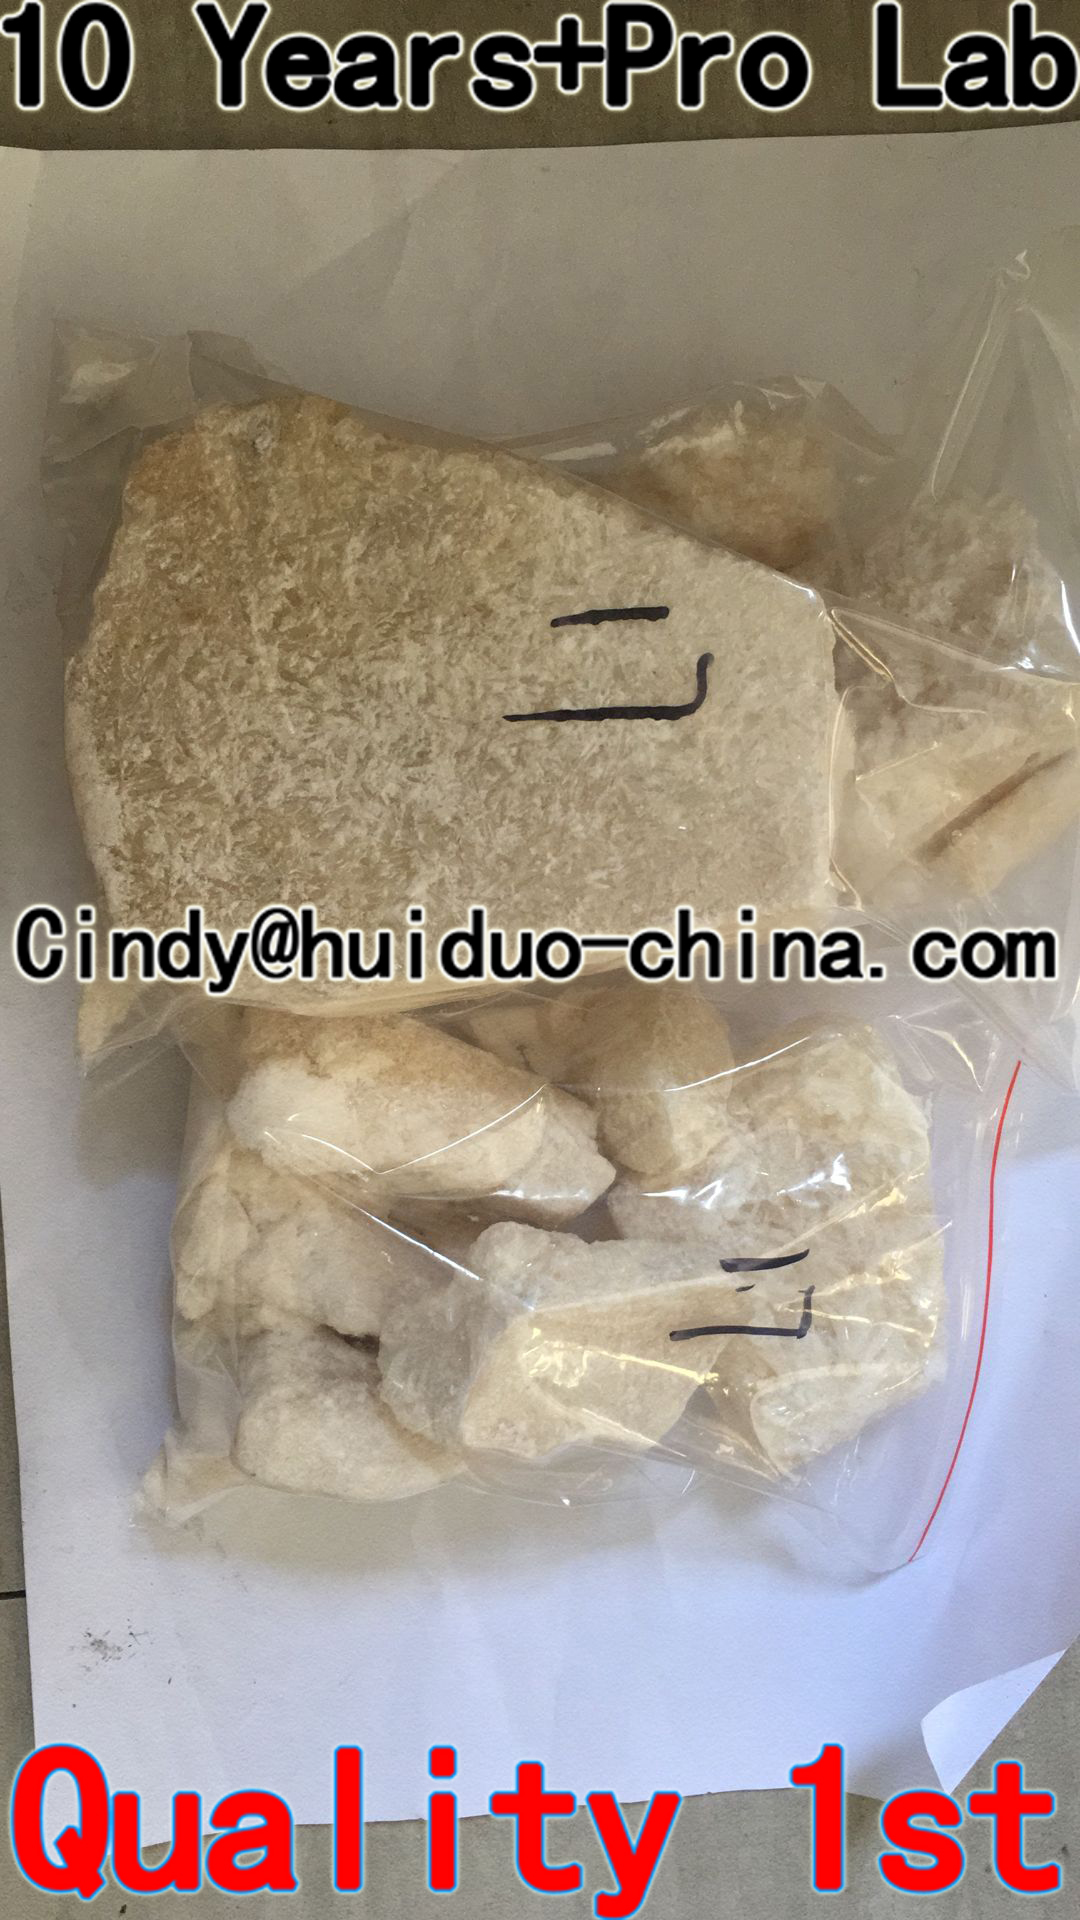 Pure Dipentylone BK-DMBDP crystals